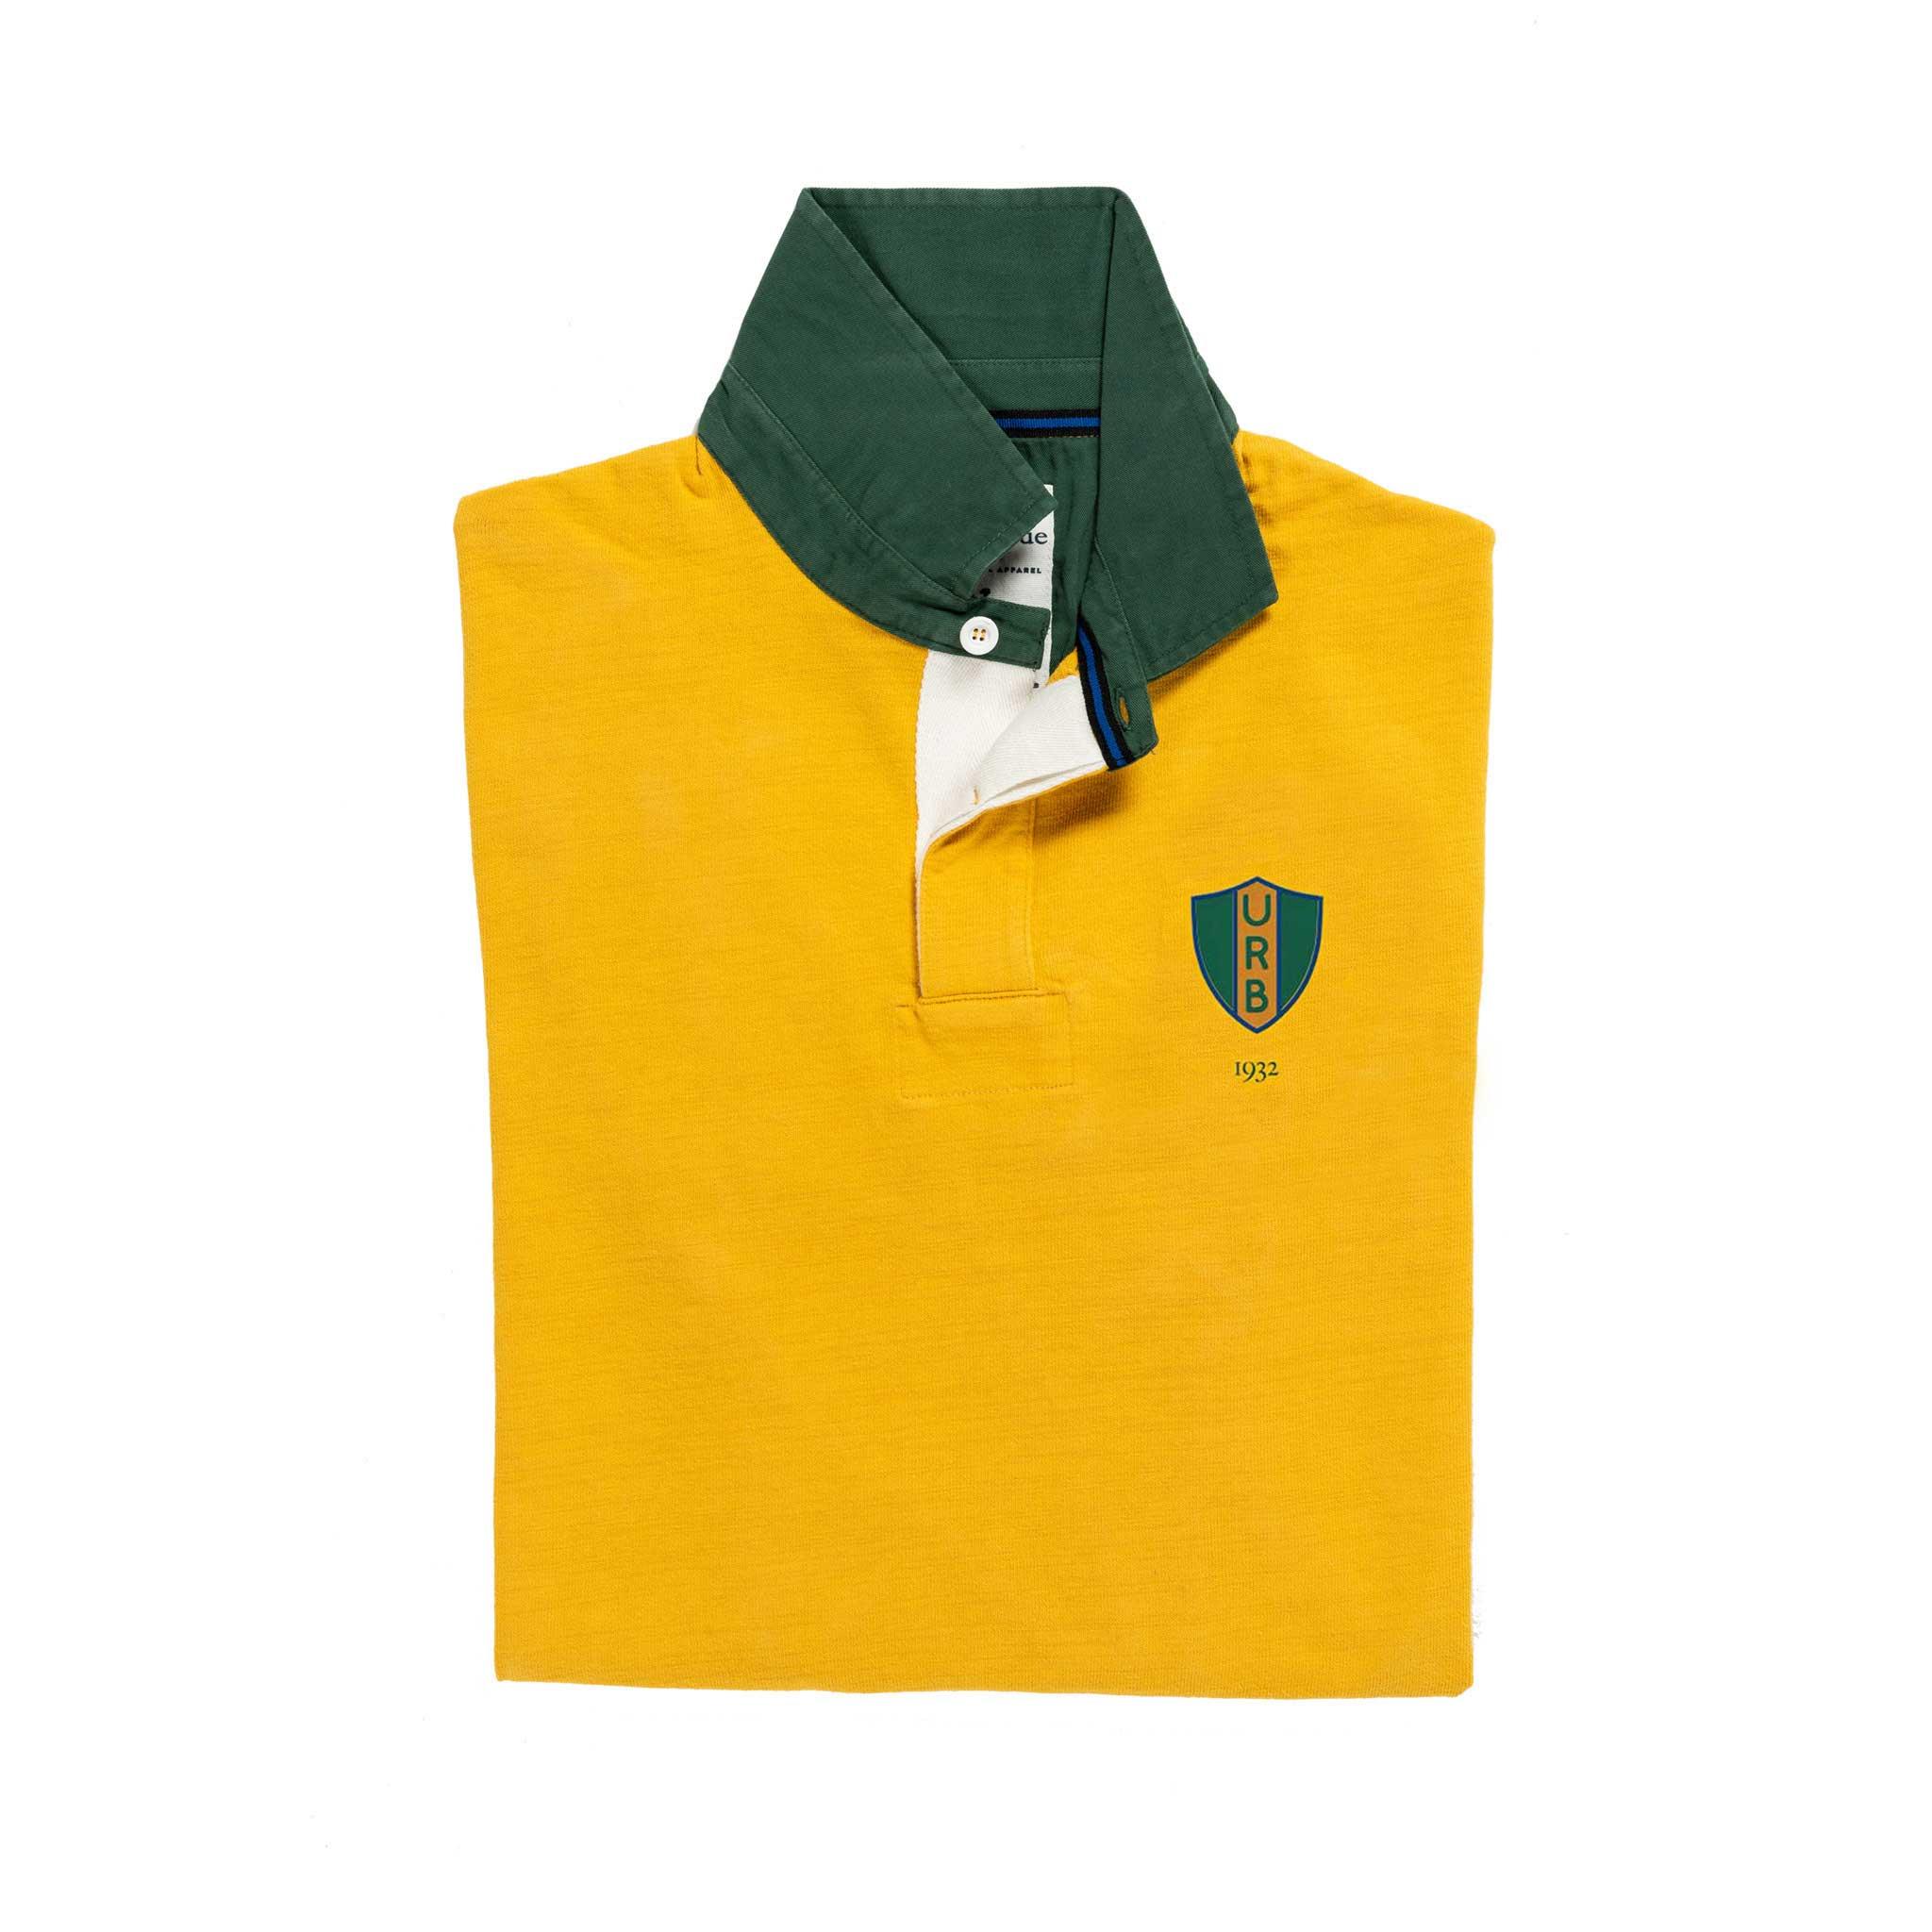 Brazil 1932 Rugby Shirt_Folded